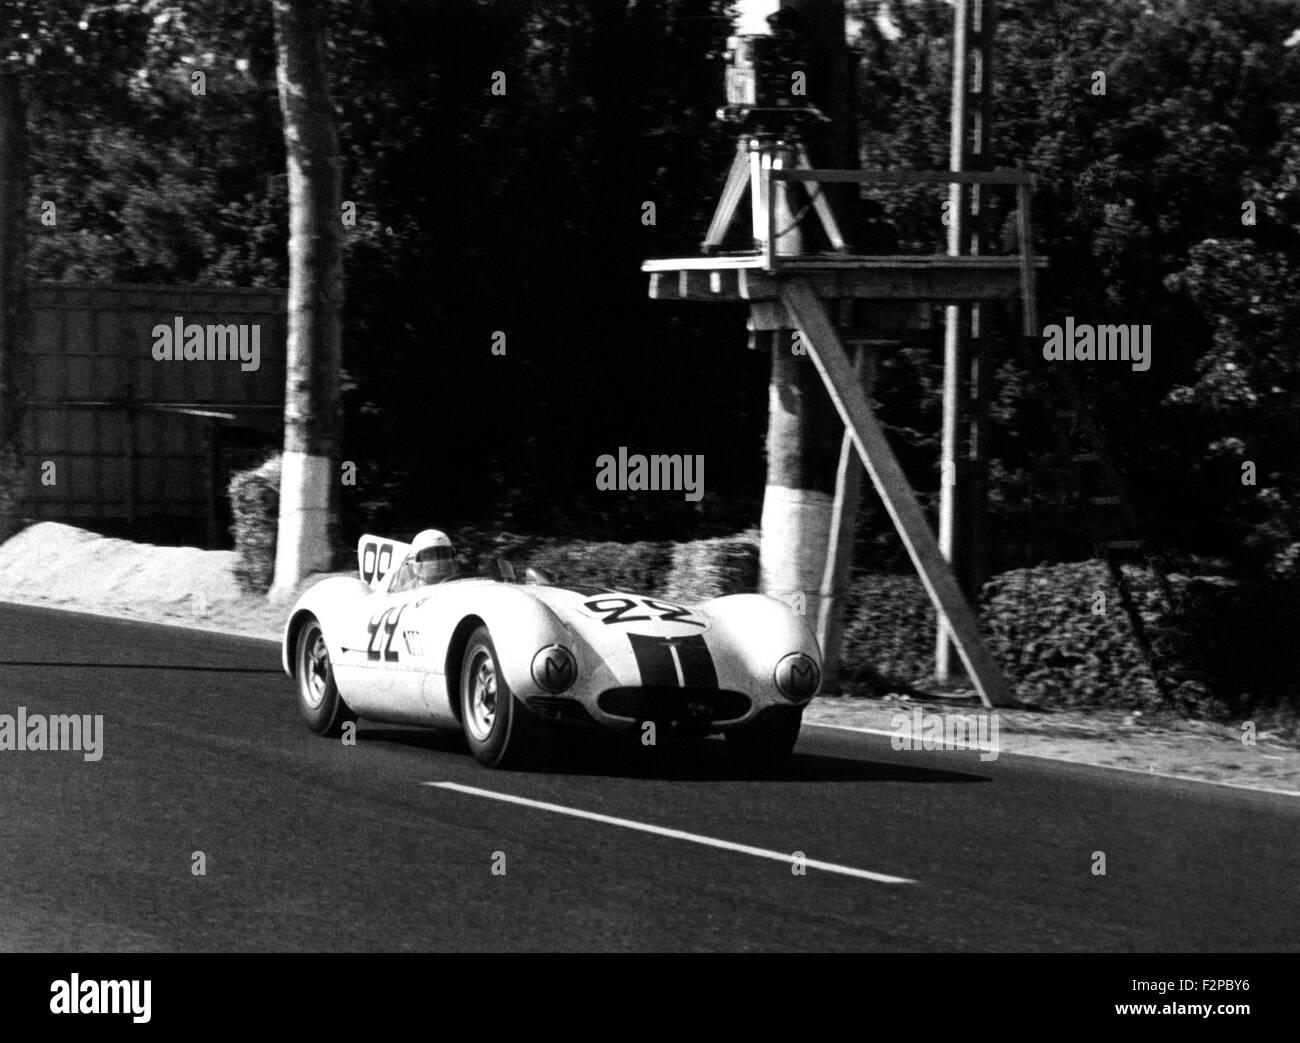 Briggs Cunningham, Sherwood Johnston Cunningham C-6R racing